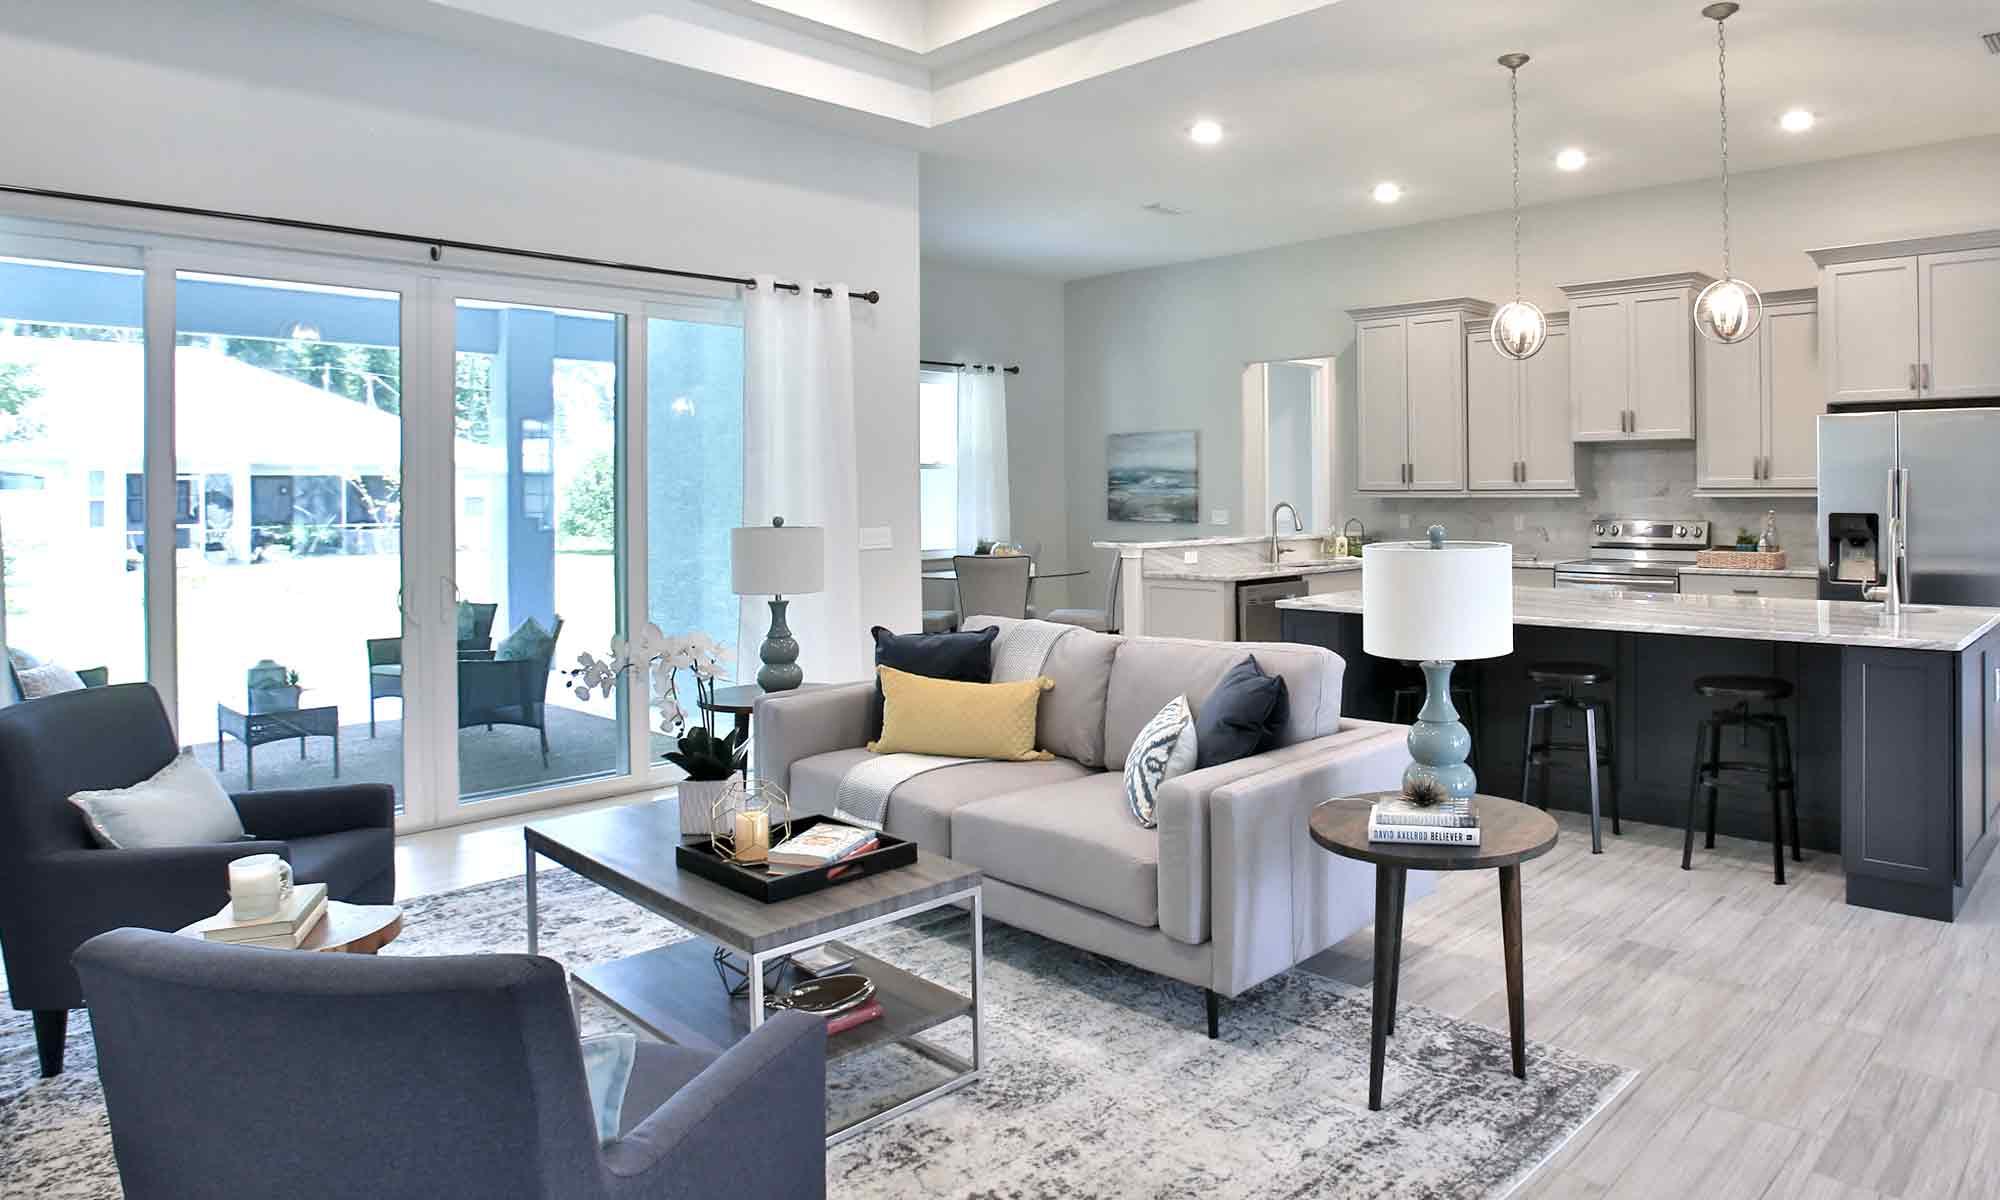 Living Room - Palm Coast, Florida | Amaral Homes and Pools in Palm Coast, Florida